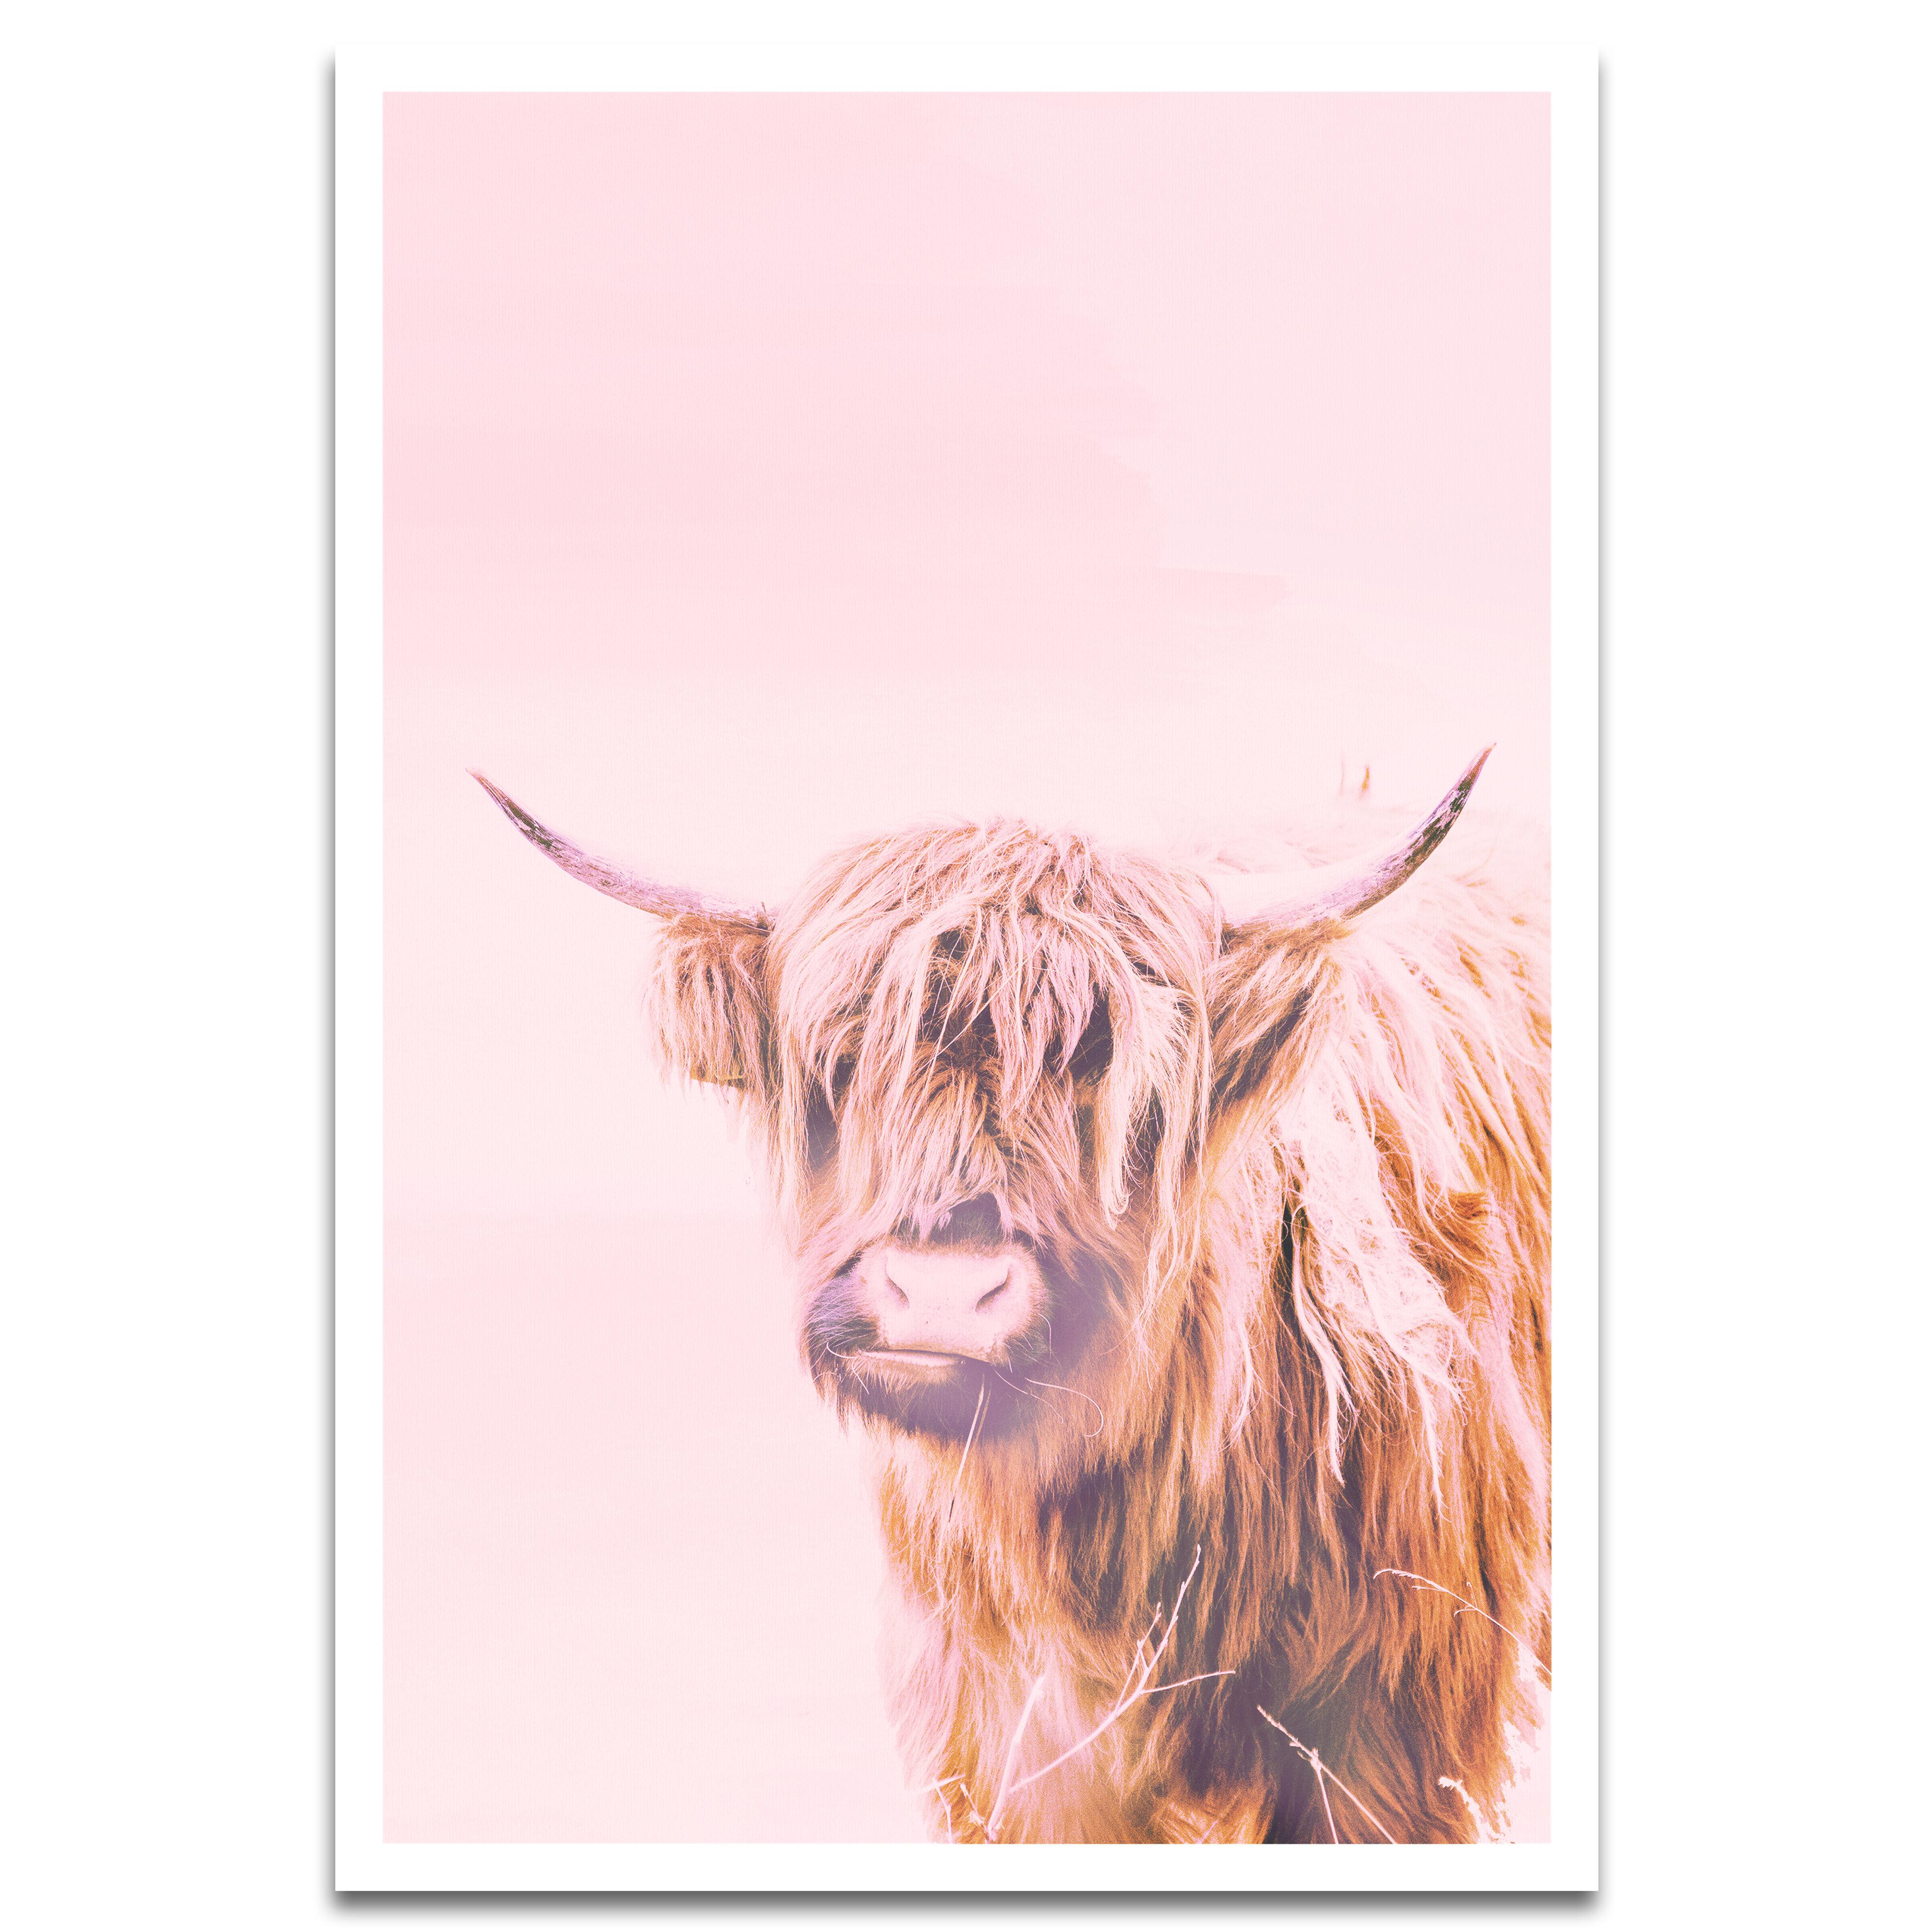 Wrought Studio A Highland Cow Graphic Art Print Reviews Wayfair